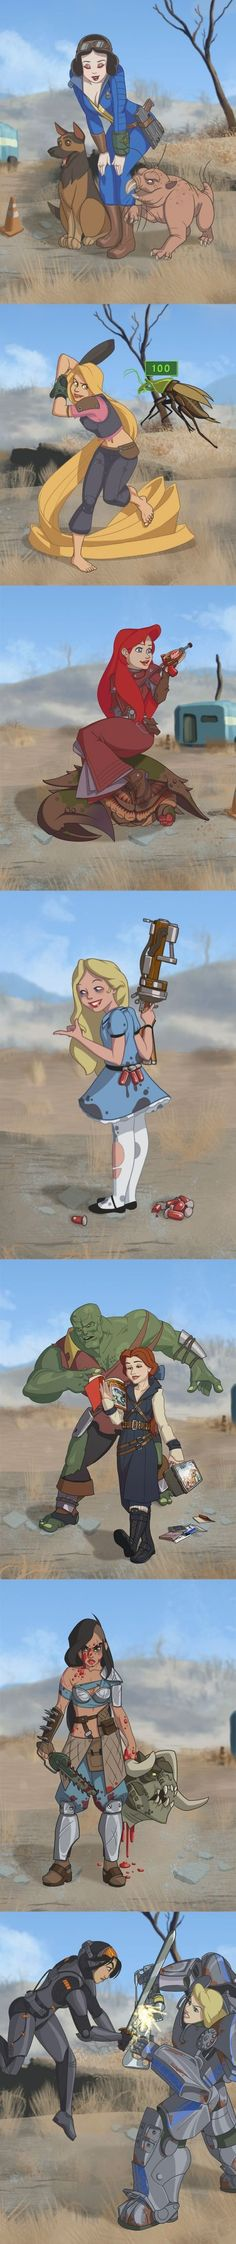 Fallout & Disney collide